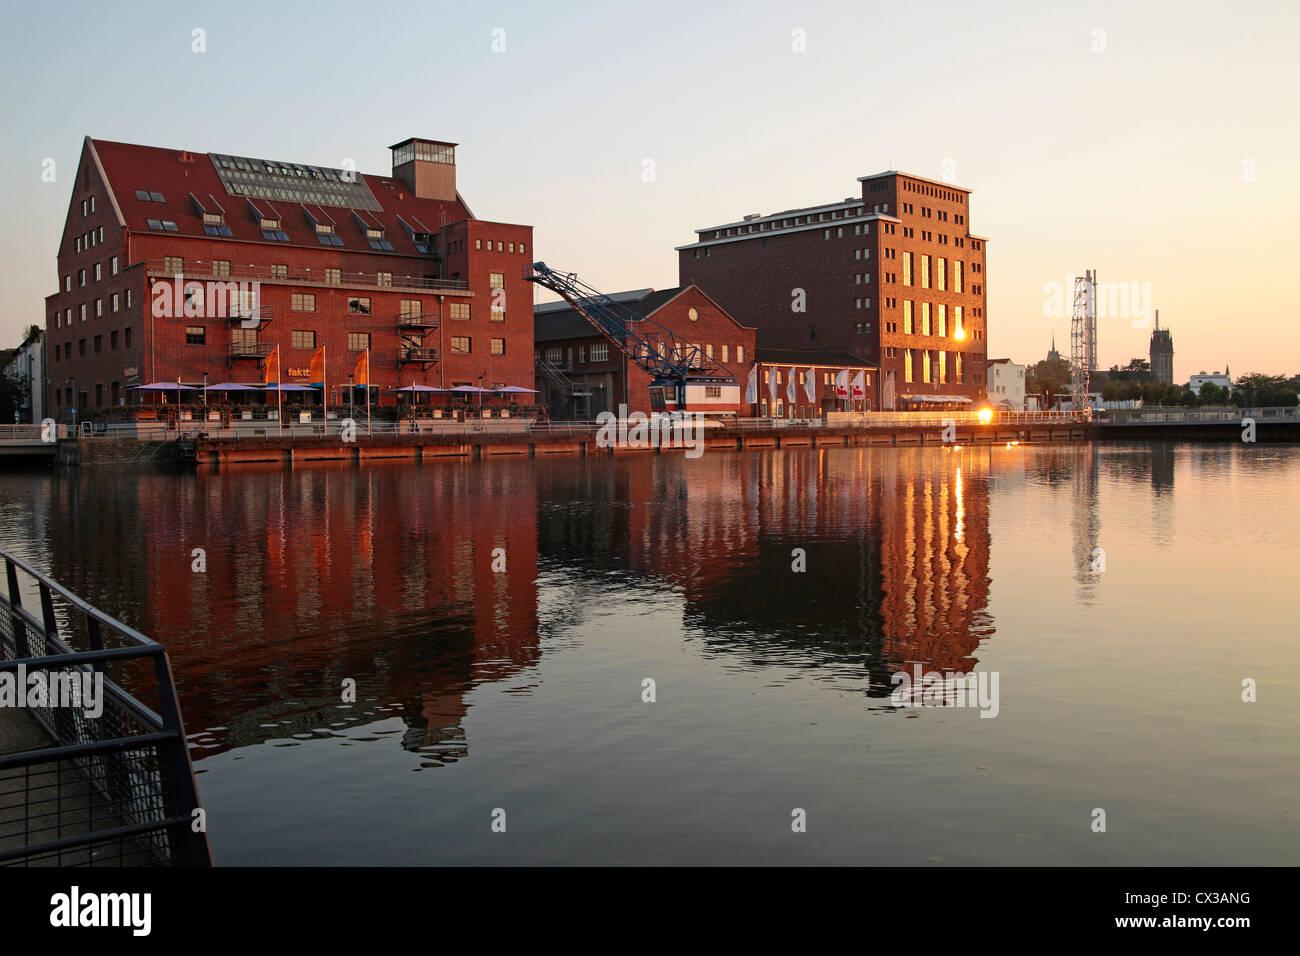 Duisburg Inner Harbour with Warehouse Werhahnmuehle, North Rhine-Westphalia, Germany, Europe - Stock Image